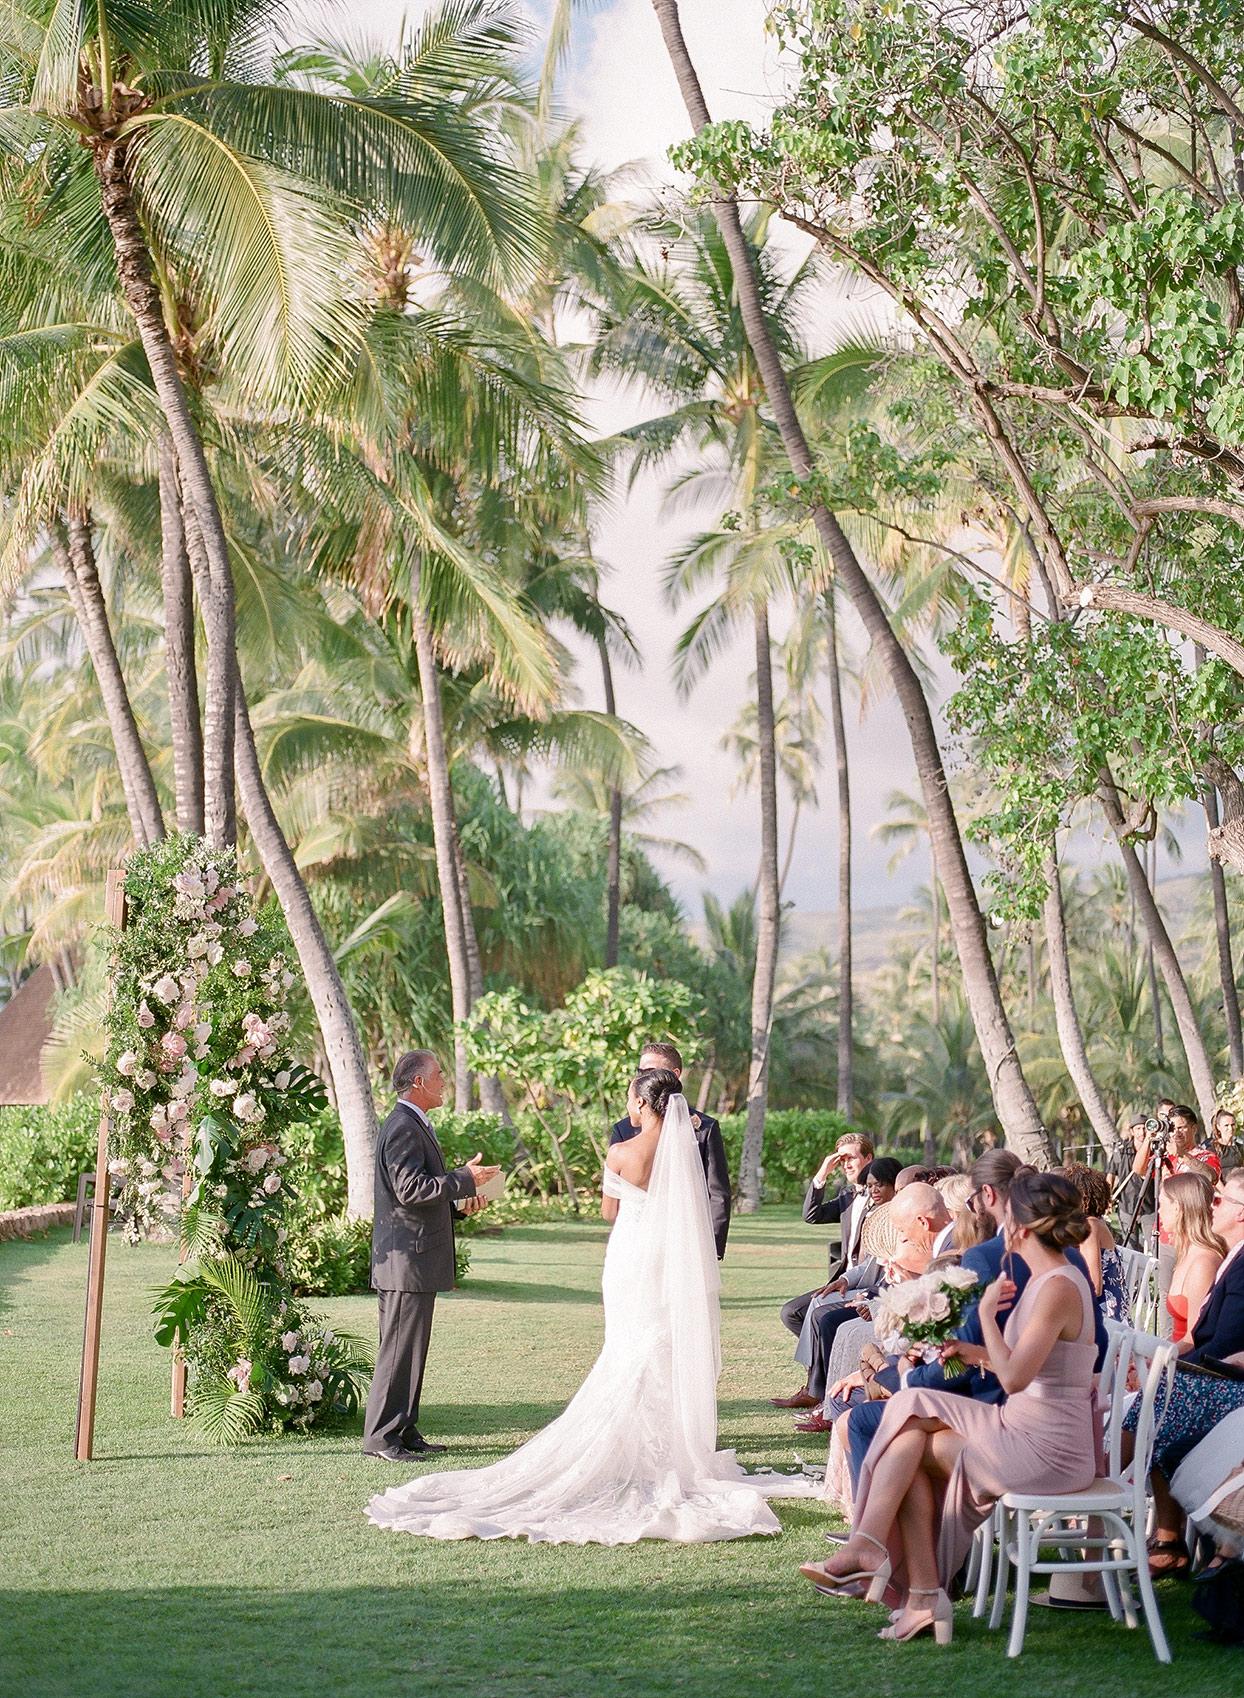 vanessa nathan wedding ceremony until Hawaiian palm trees